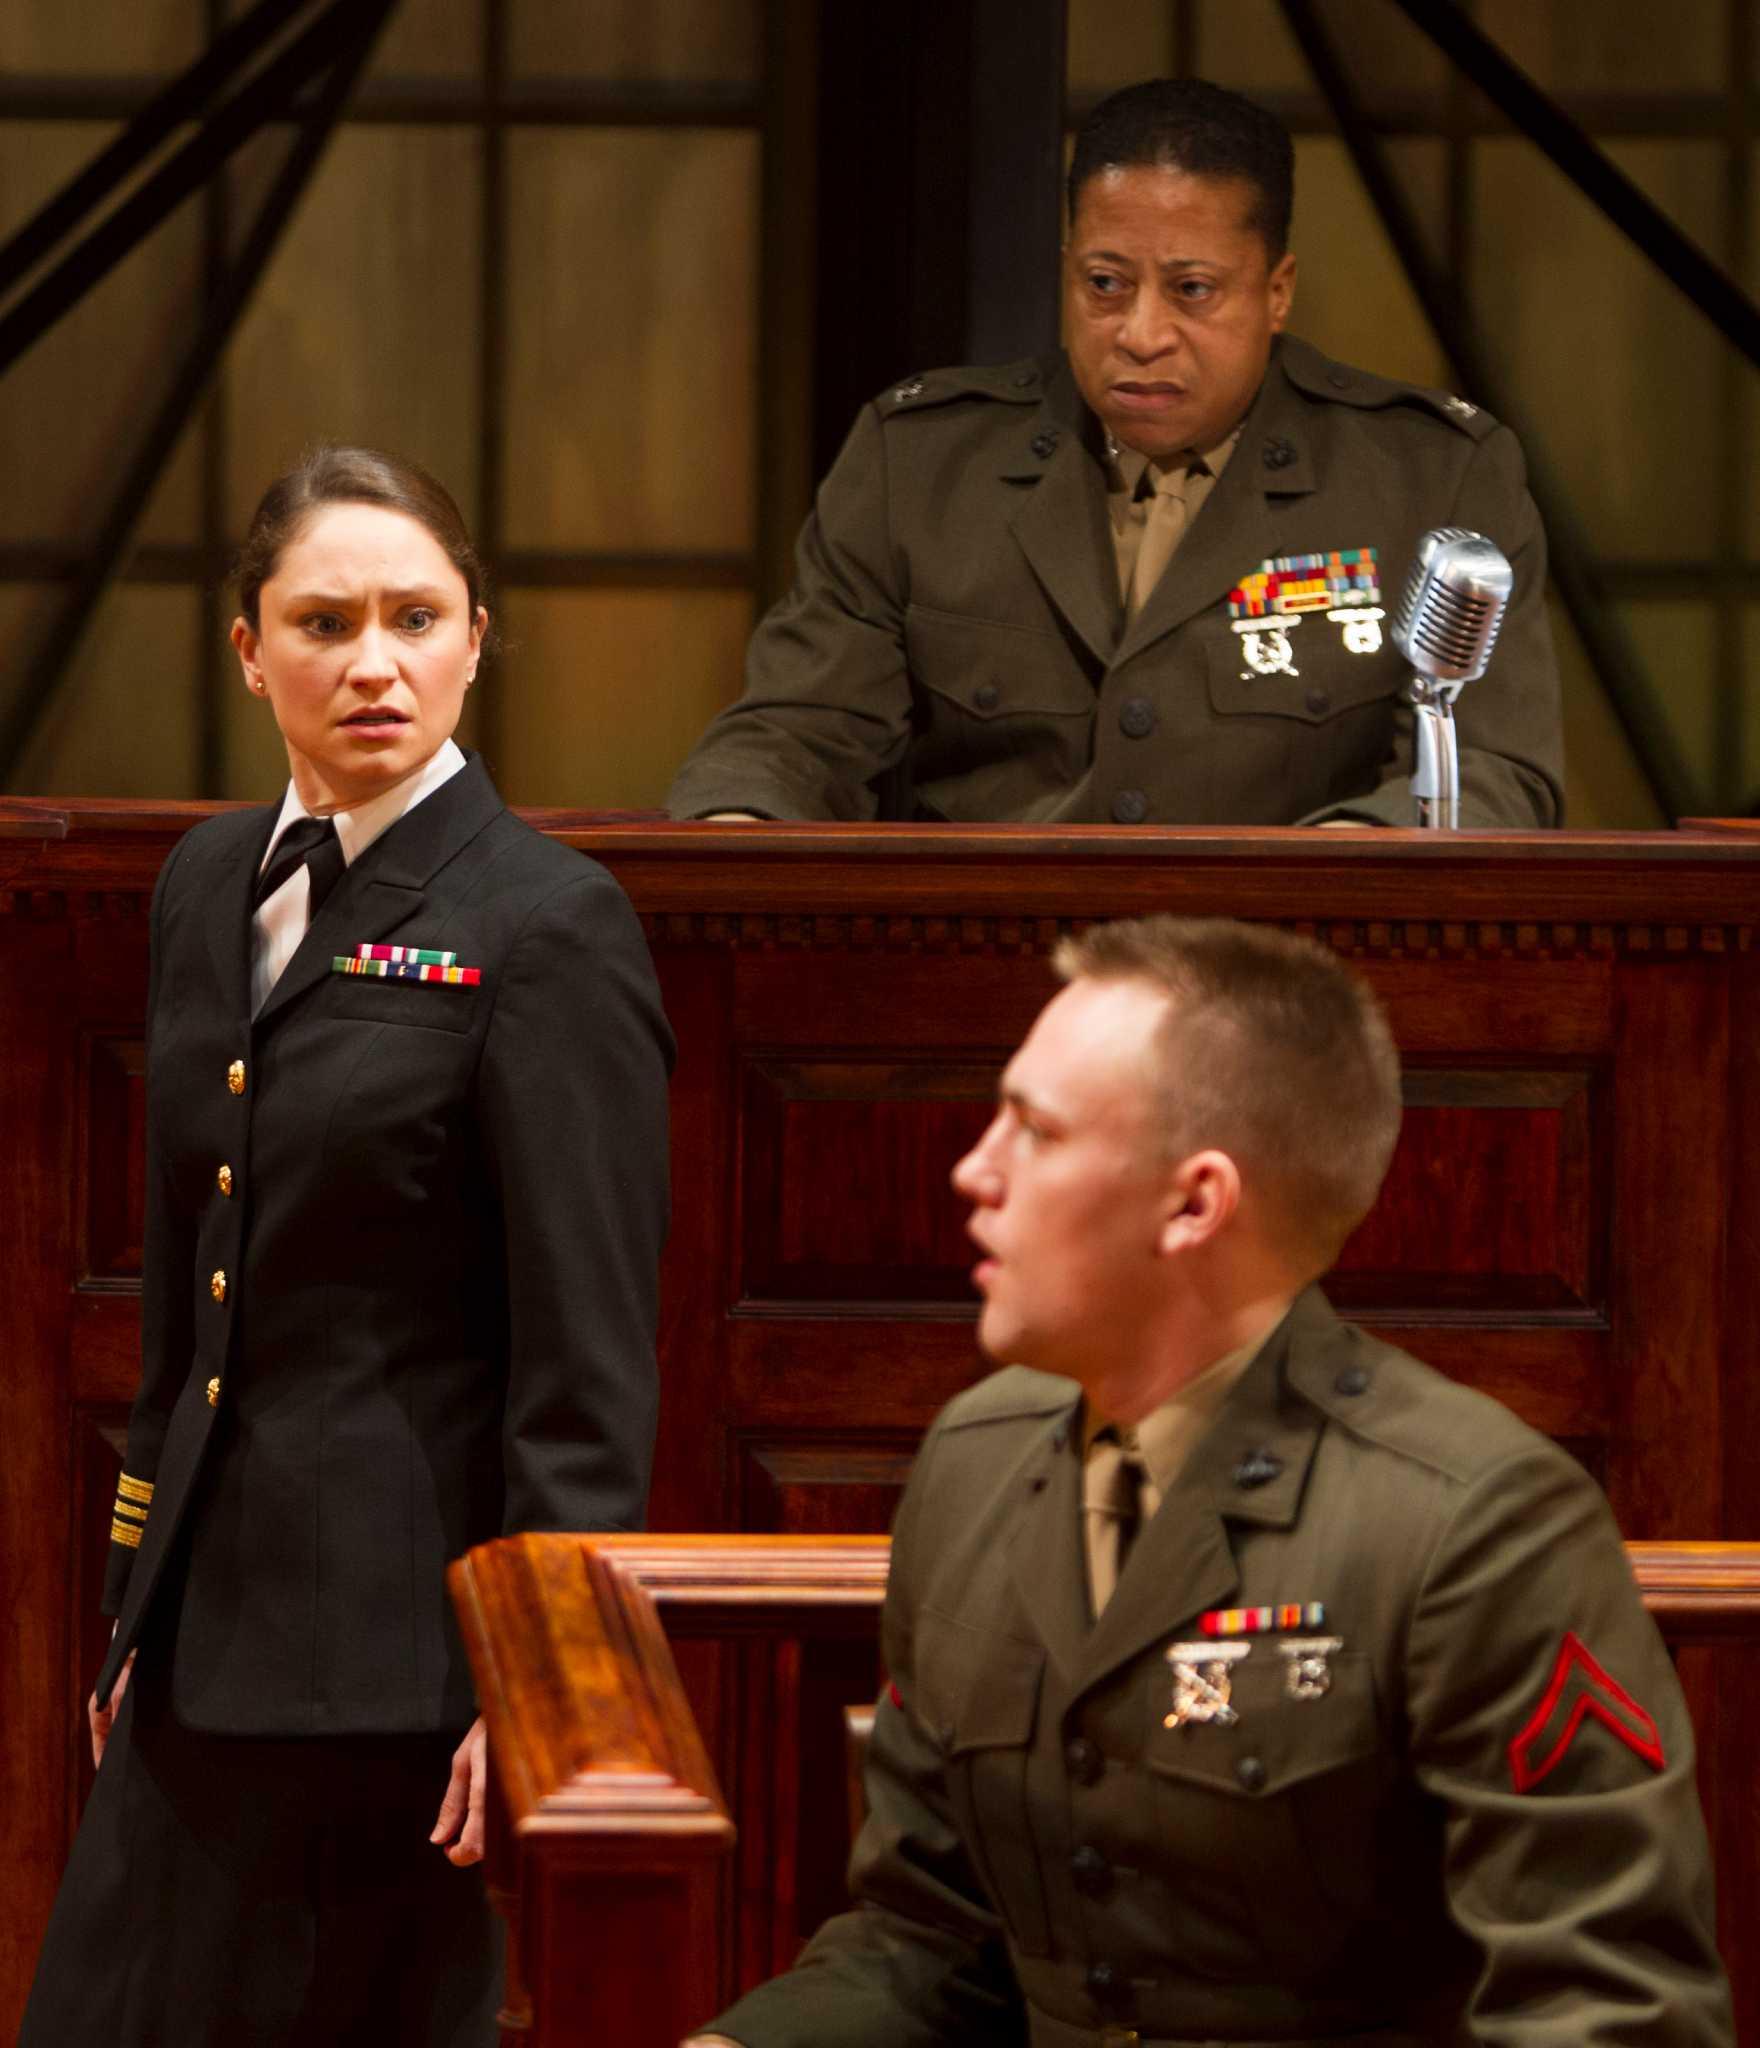 Courtroom conflict - big surprises and suspense ...